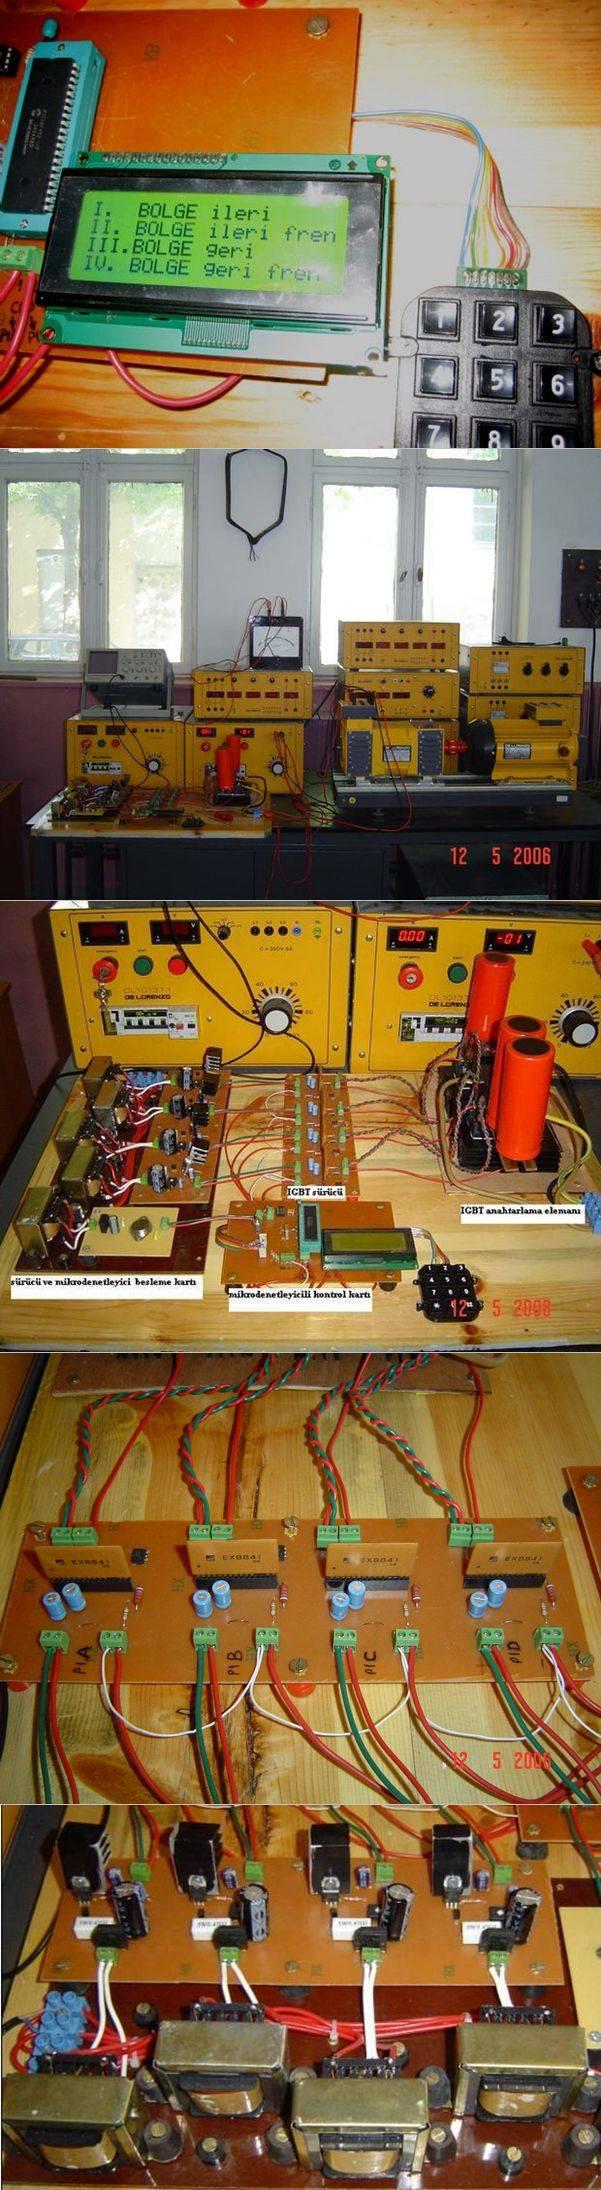 dgm-dogru-akim-motoru-hiz-hiz-kontrolu-igbt-kontrol-motor-pic18f4520